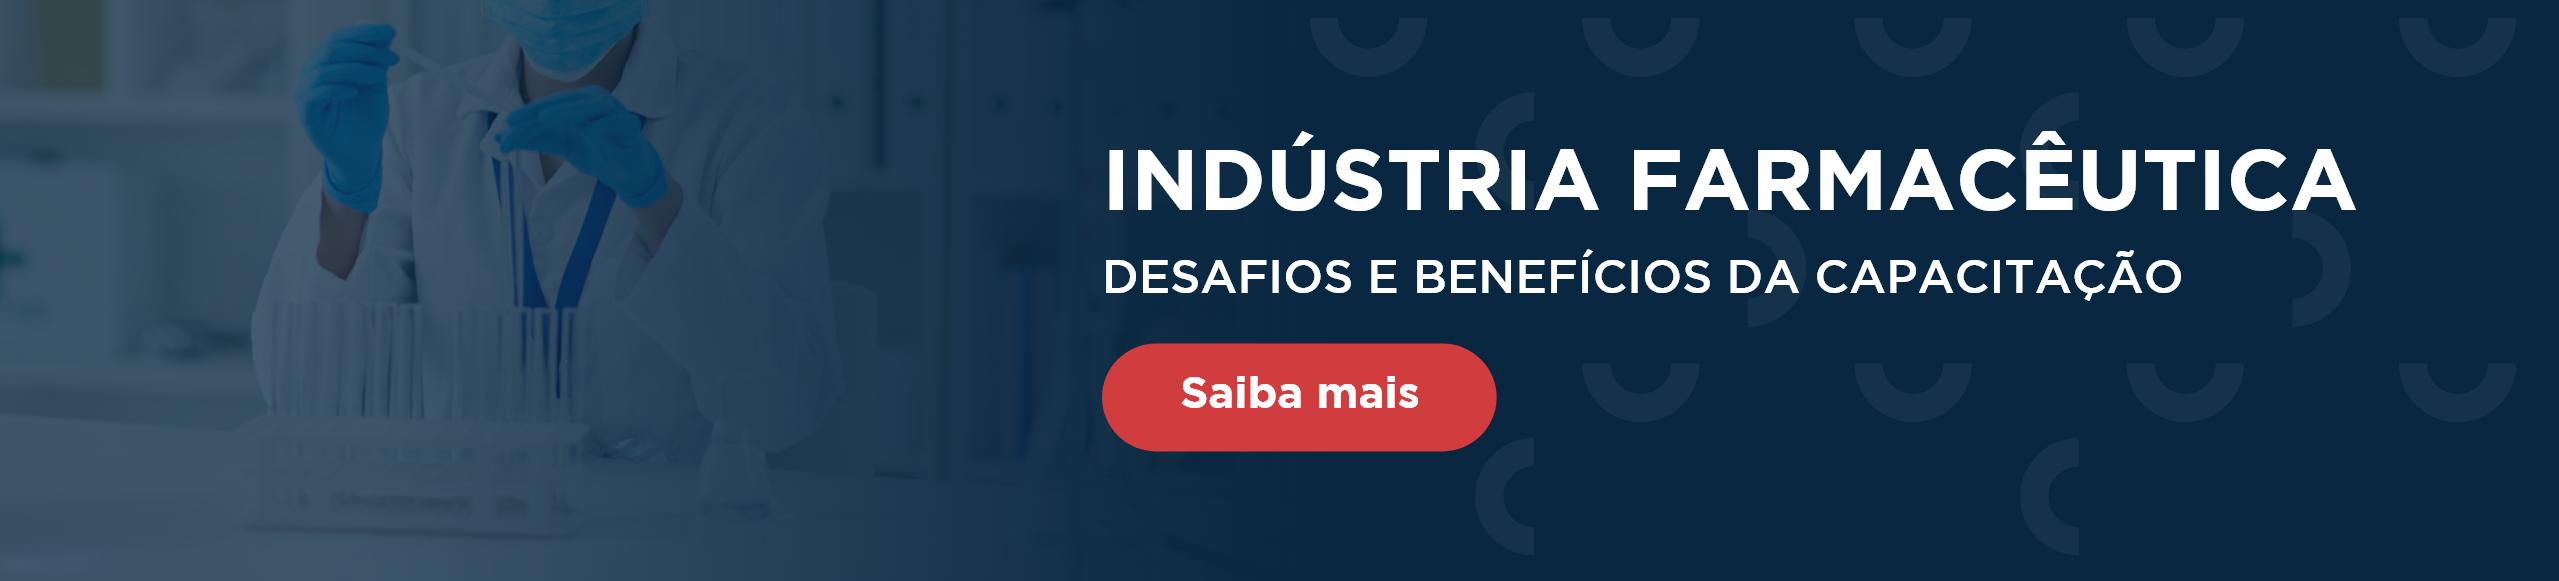 blog-dotcm-os-novos-tempos-da-capacitacao-digital-no-setor-farmaceutico-relatorio-industria-farmaceutica